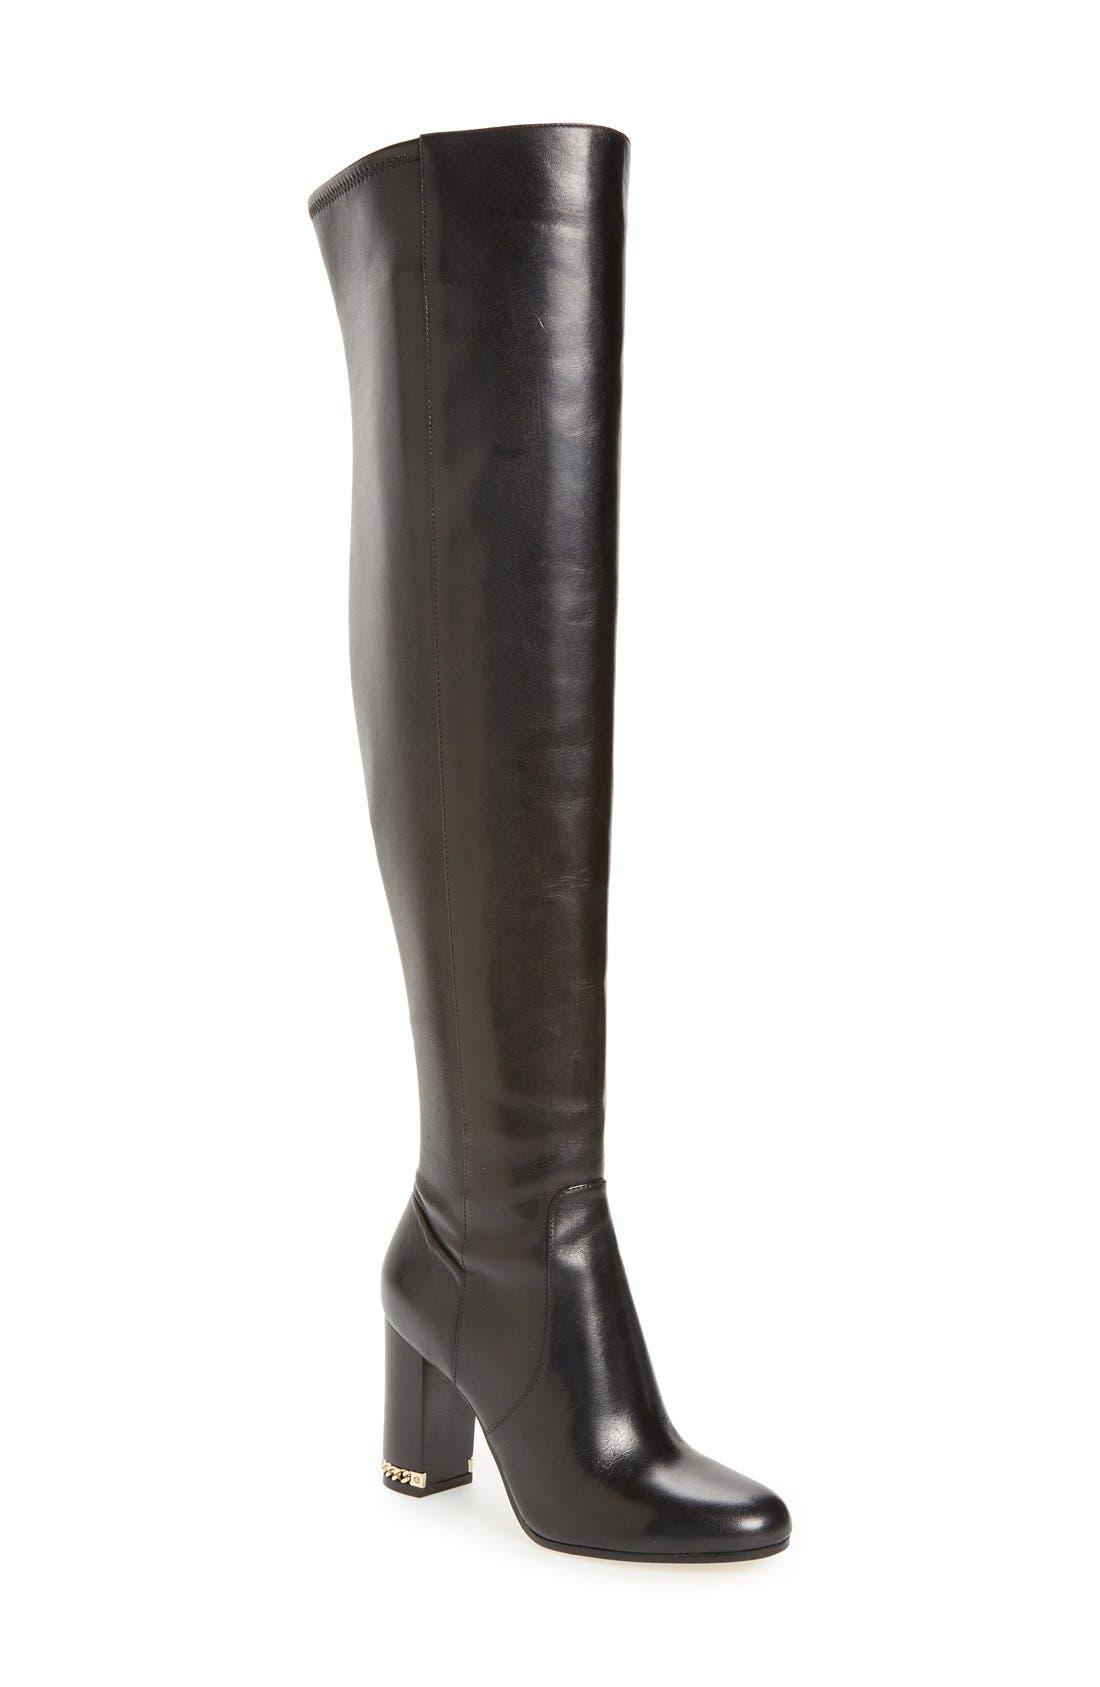 Alternate Image 1 Selected - MICHAEL Michael Kors Sabrina Over the Knee Boot (Women)